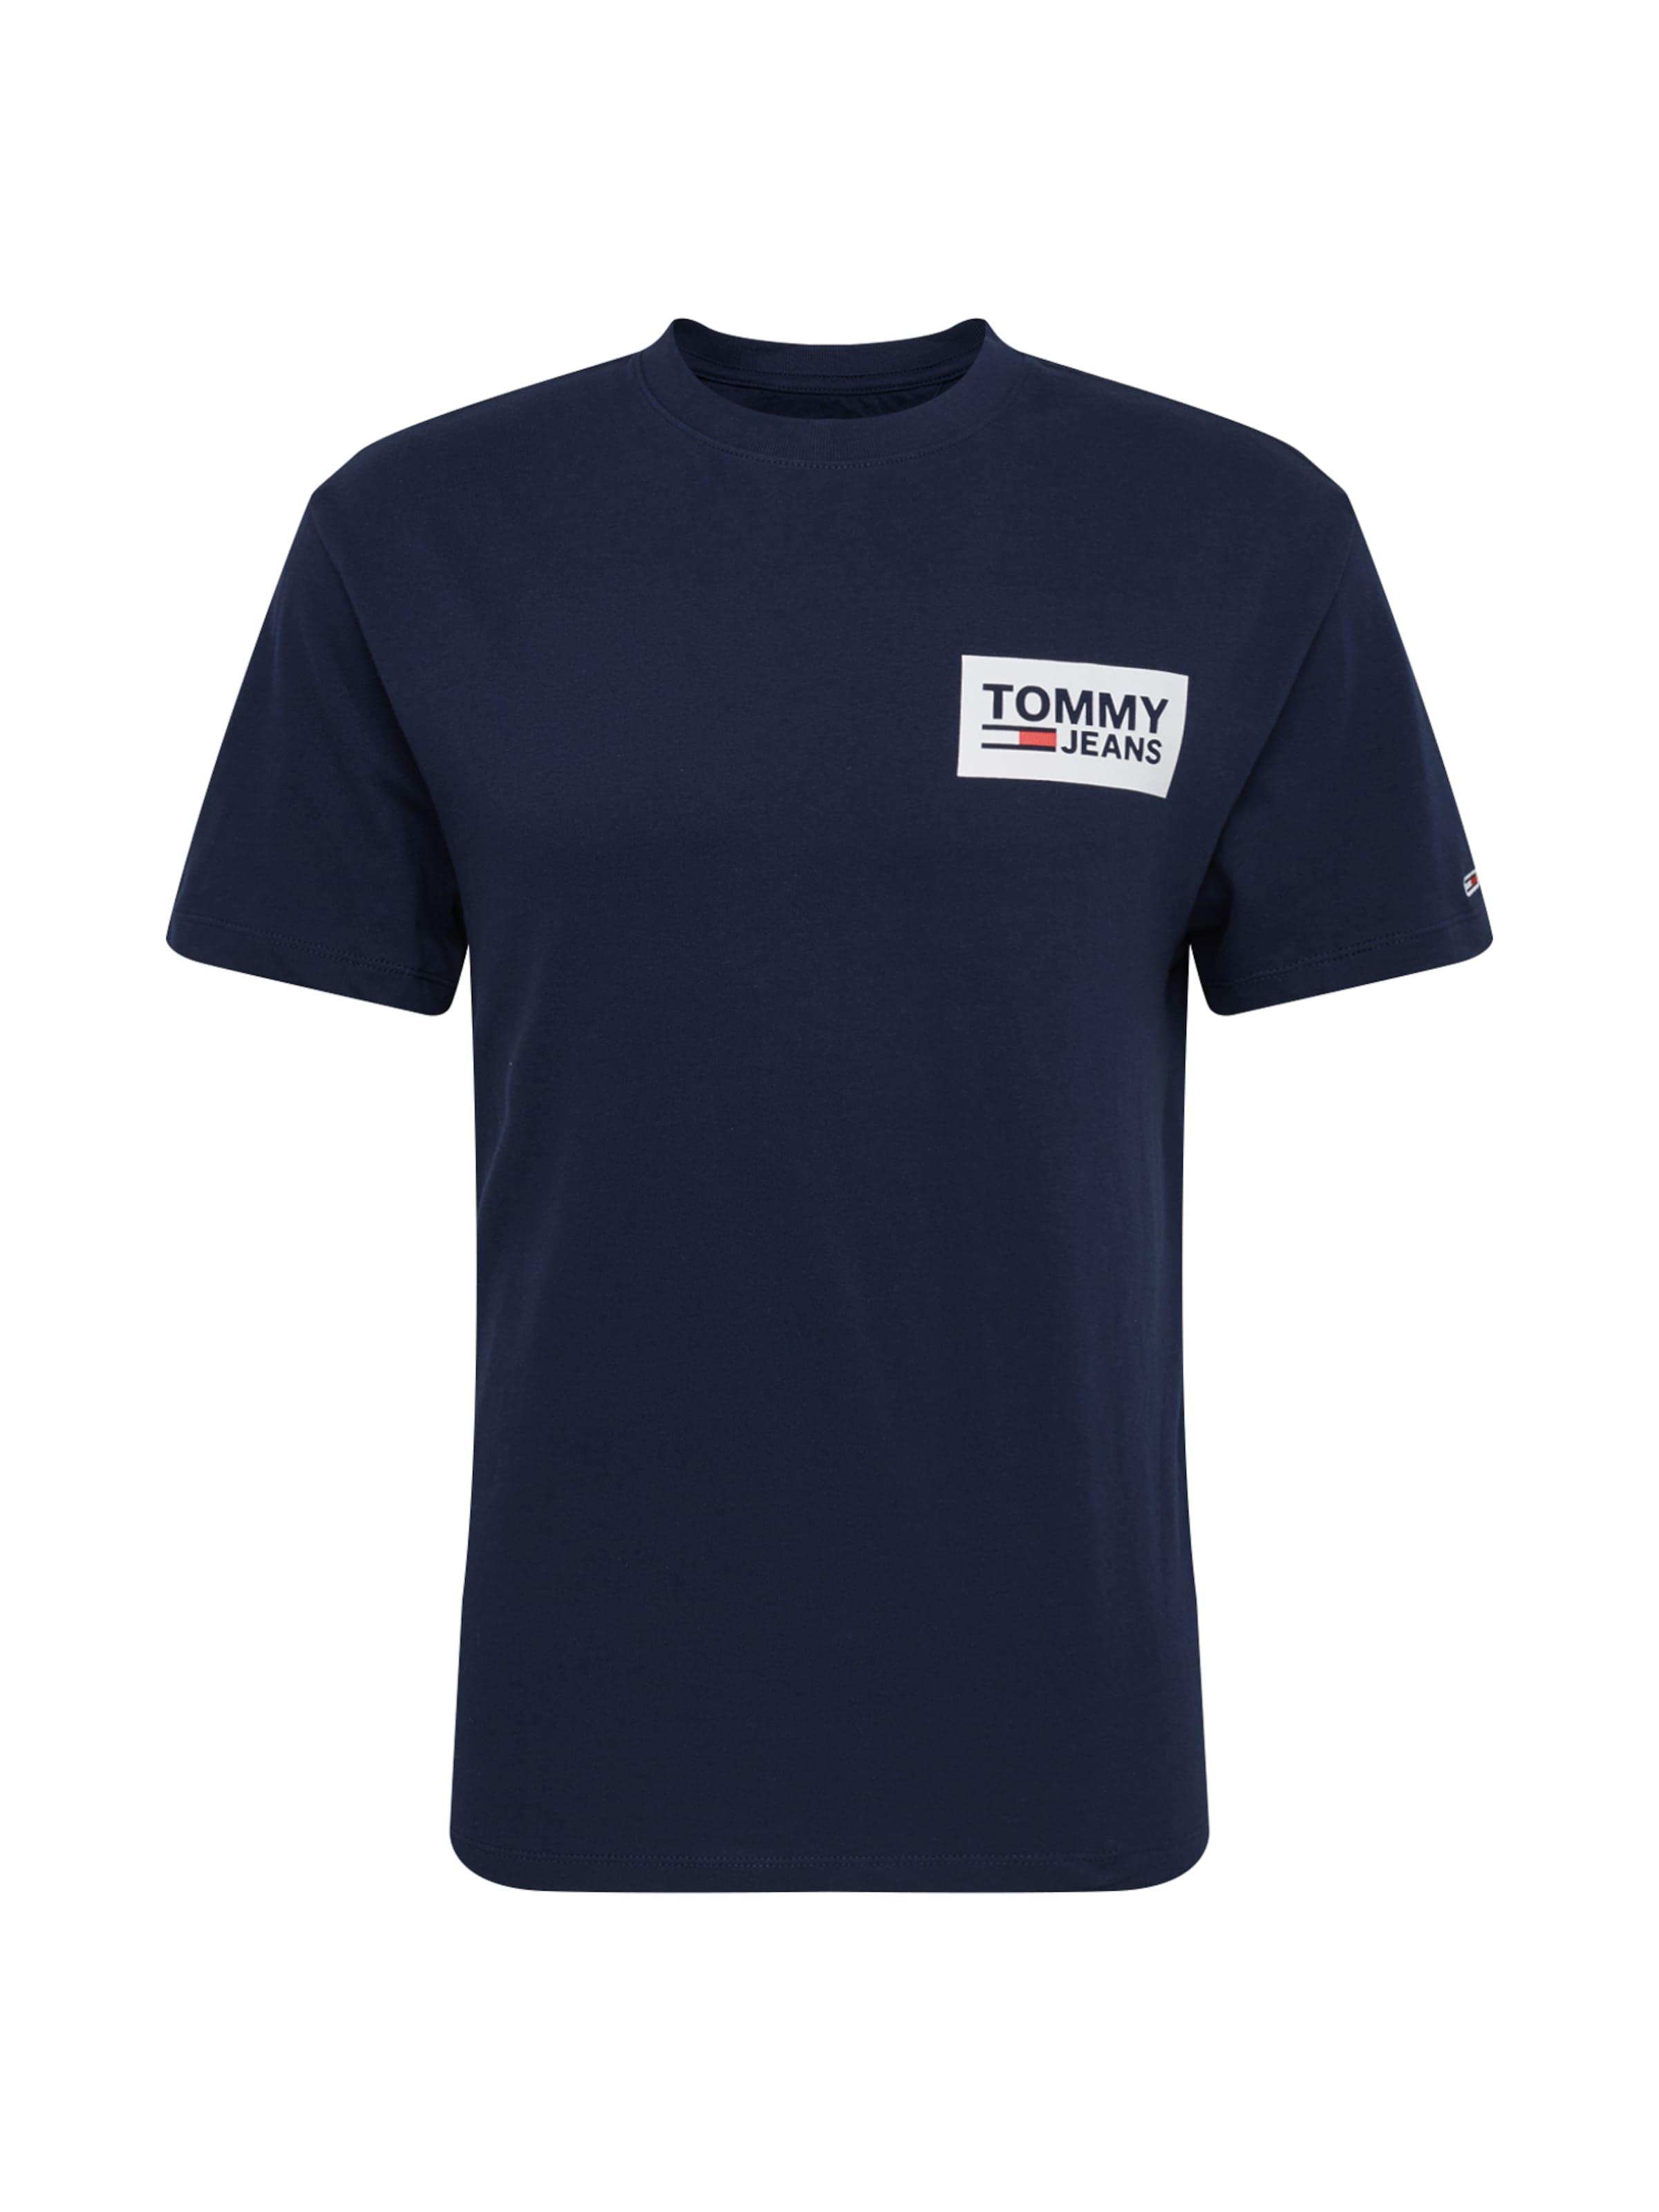 shirt DunkelblauWeiß T In Jeans Tommy 34AqjL5R